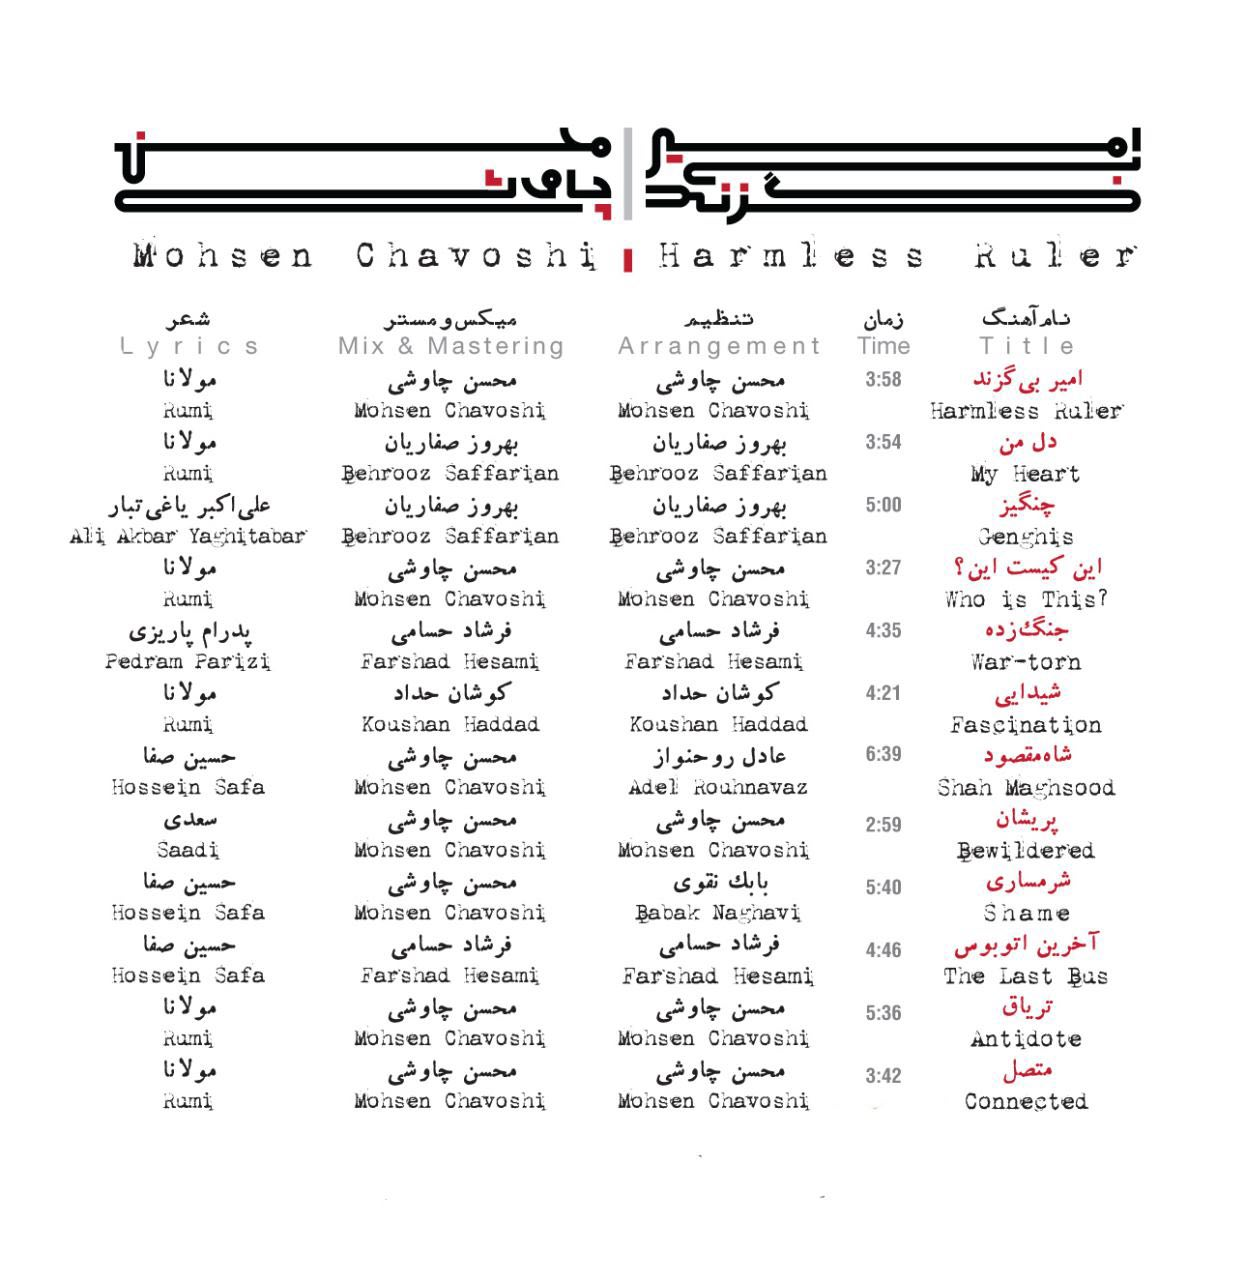 http://s6.picofile.com/file/8254539426/Mohsen_Chavoshi_Amir_e_Bi_Gazand_I.jpg